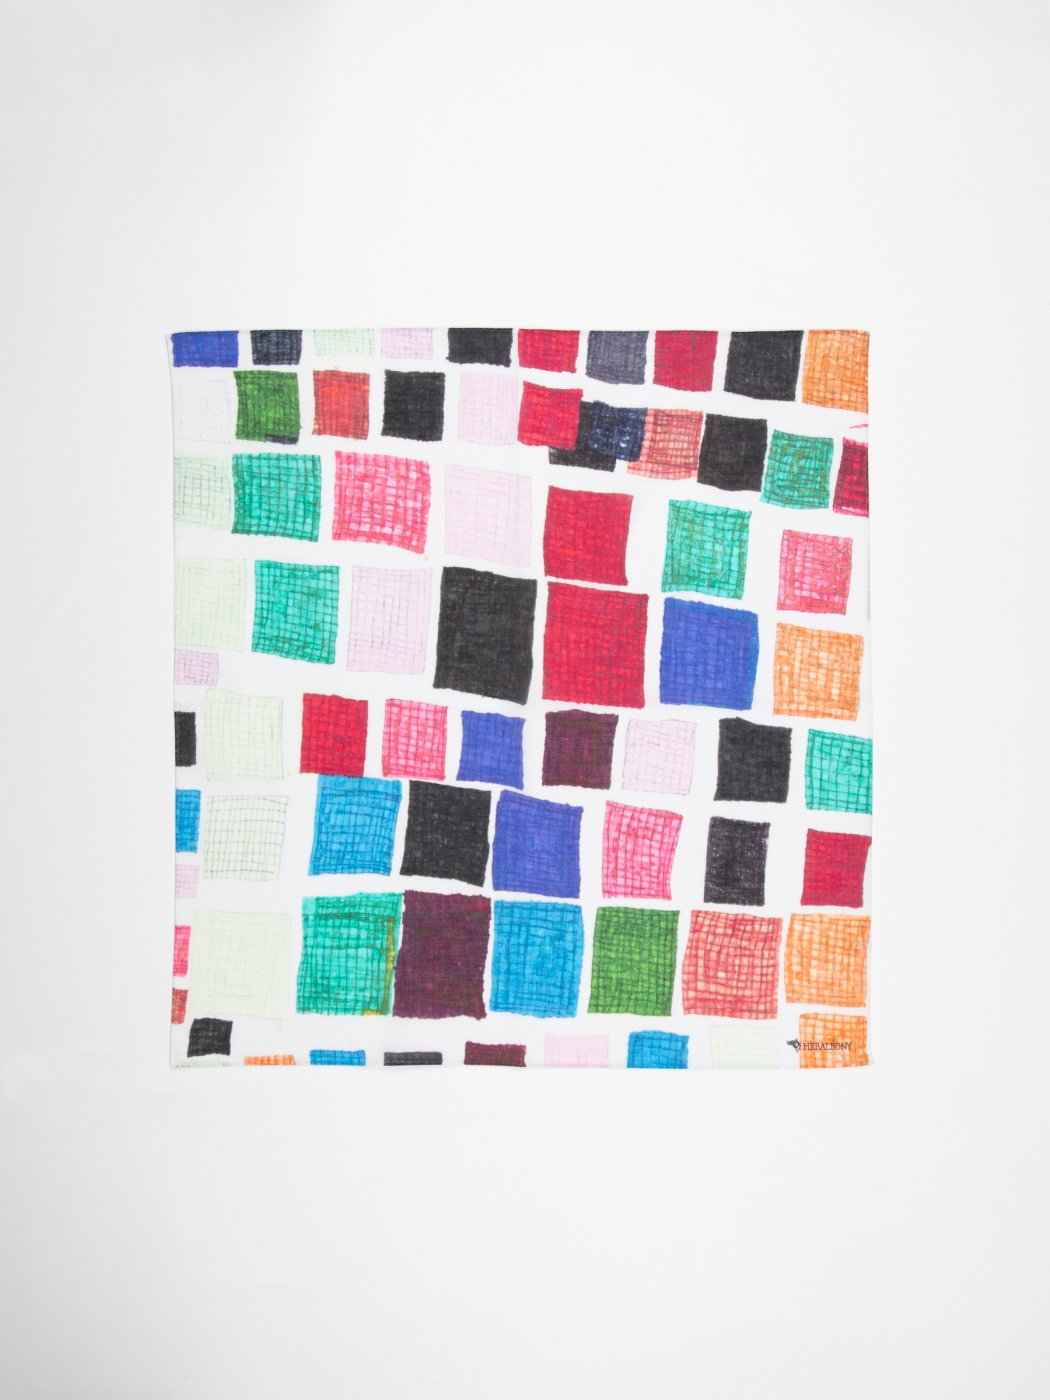 HERALBONY -ART HANDKERCHIEF- Sanae Sasaki -NO TITLE -WHITE-